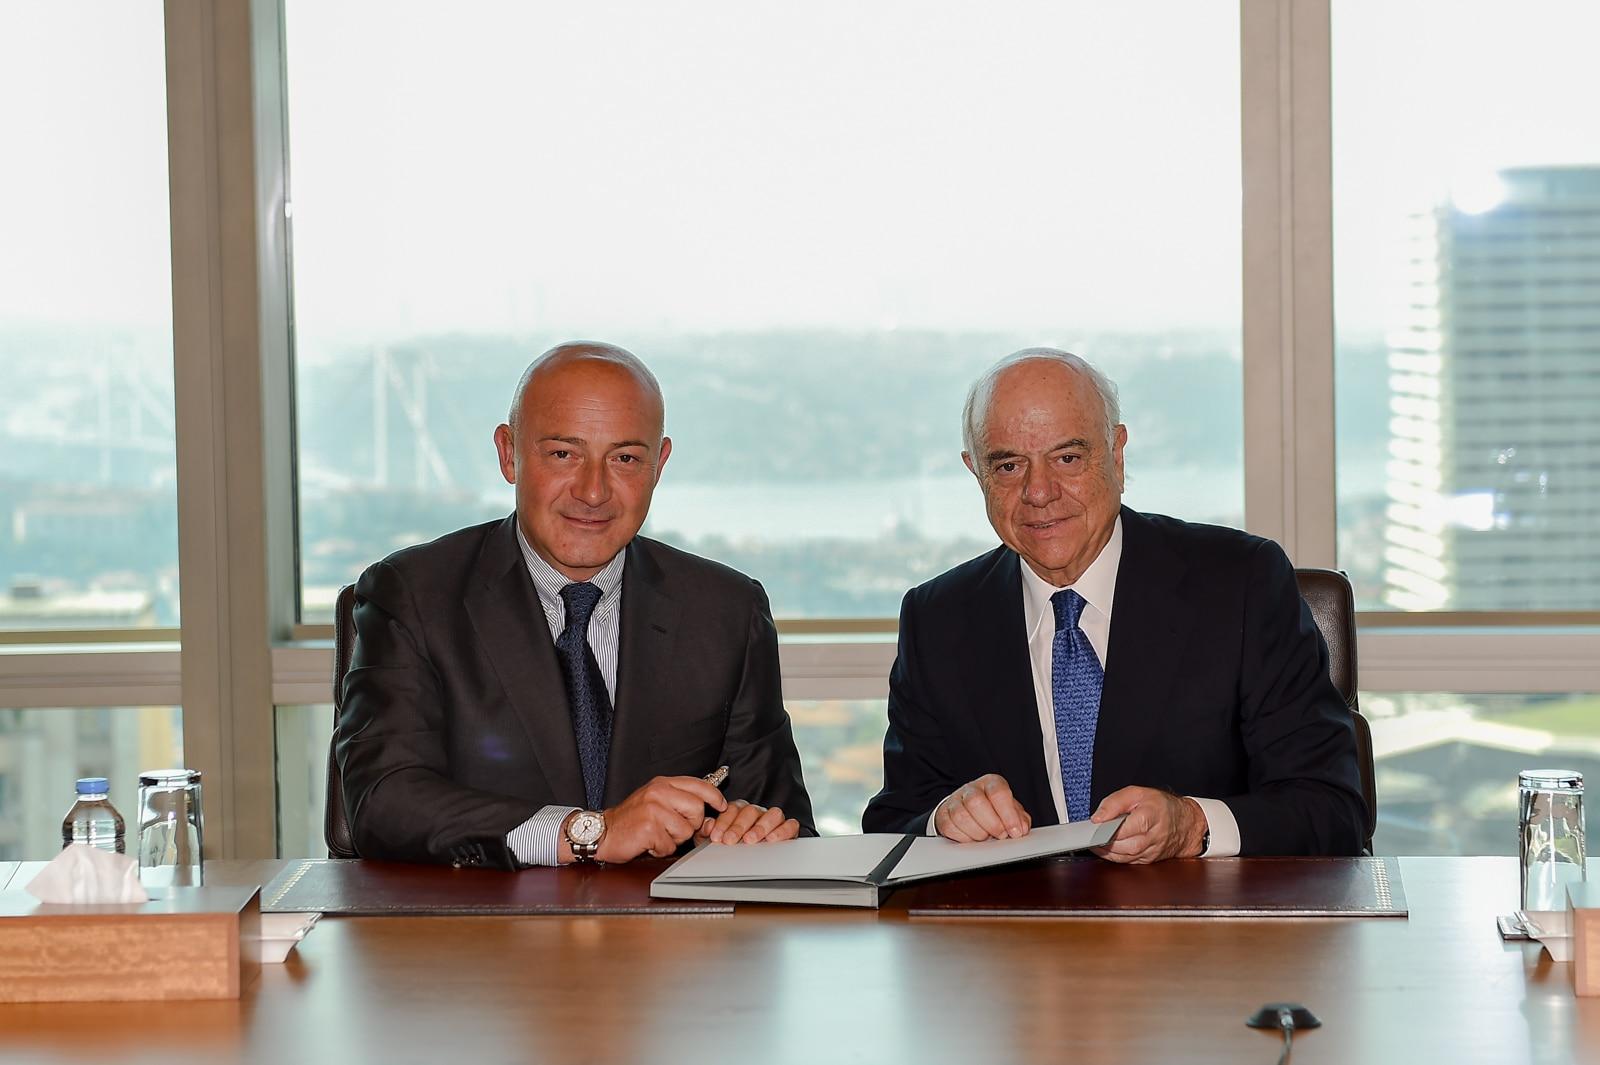 Picture Francisco González, president of BBVA, and Ferit Sahenk, president of Garanti